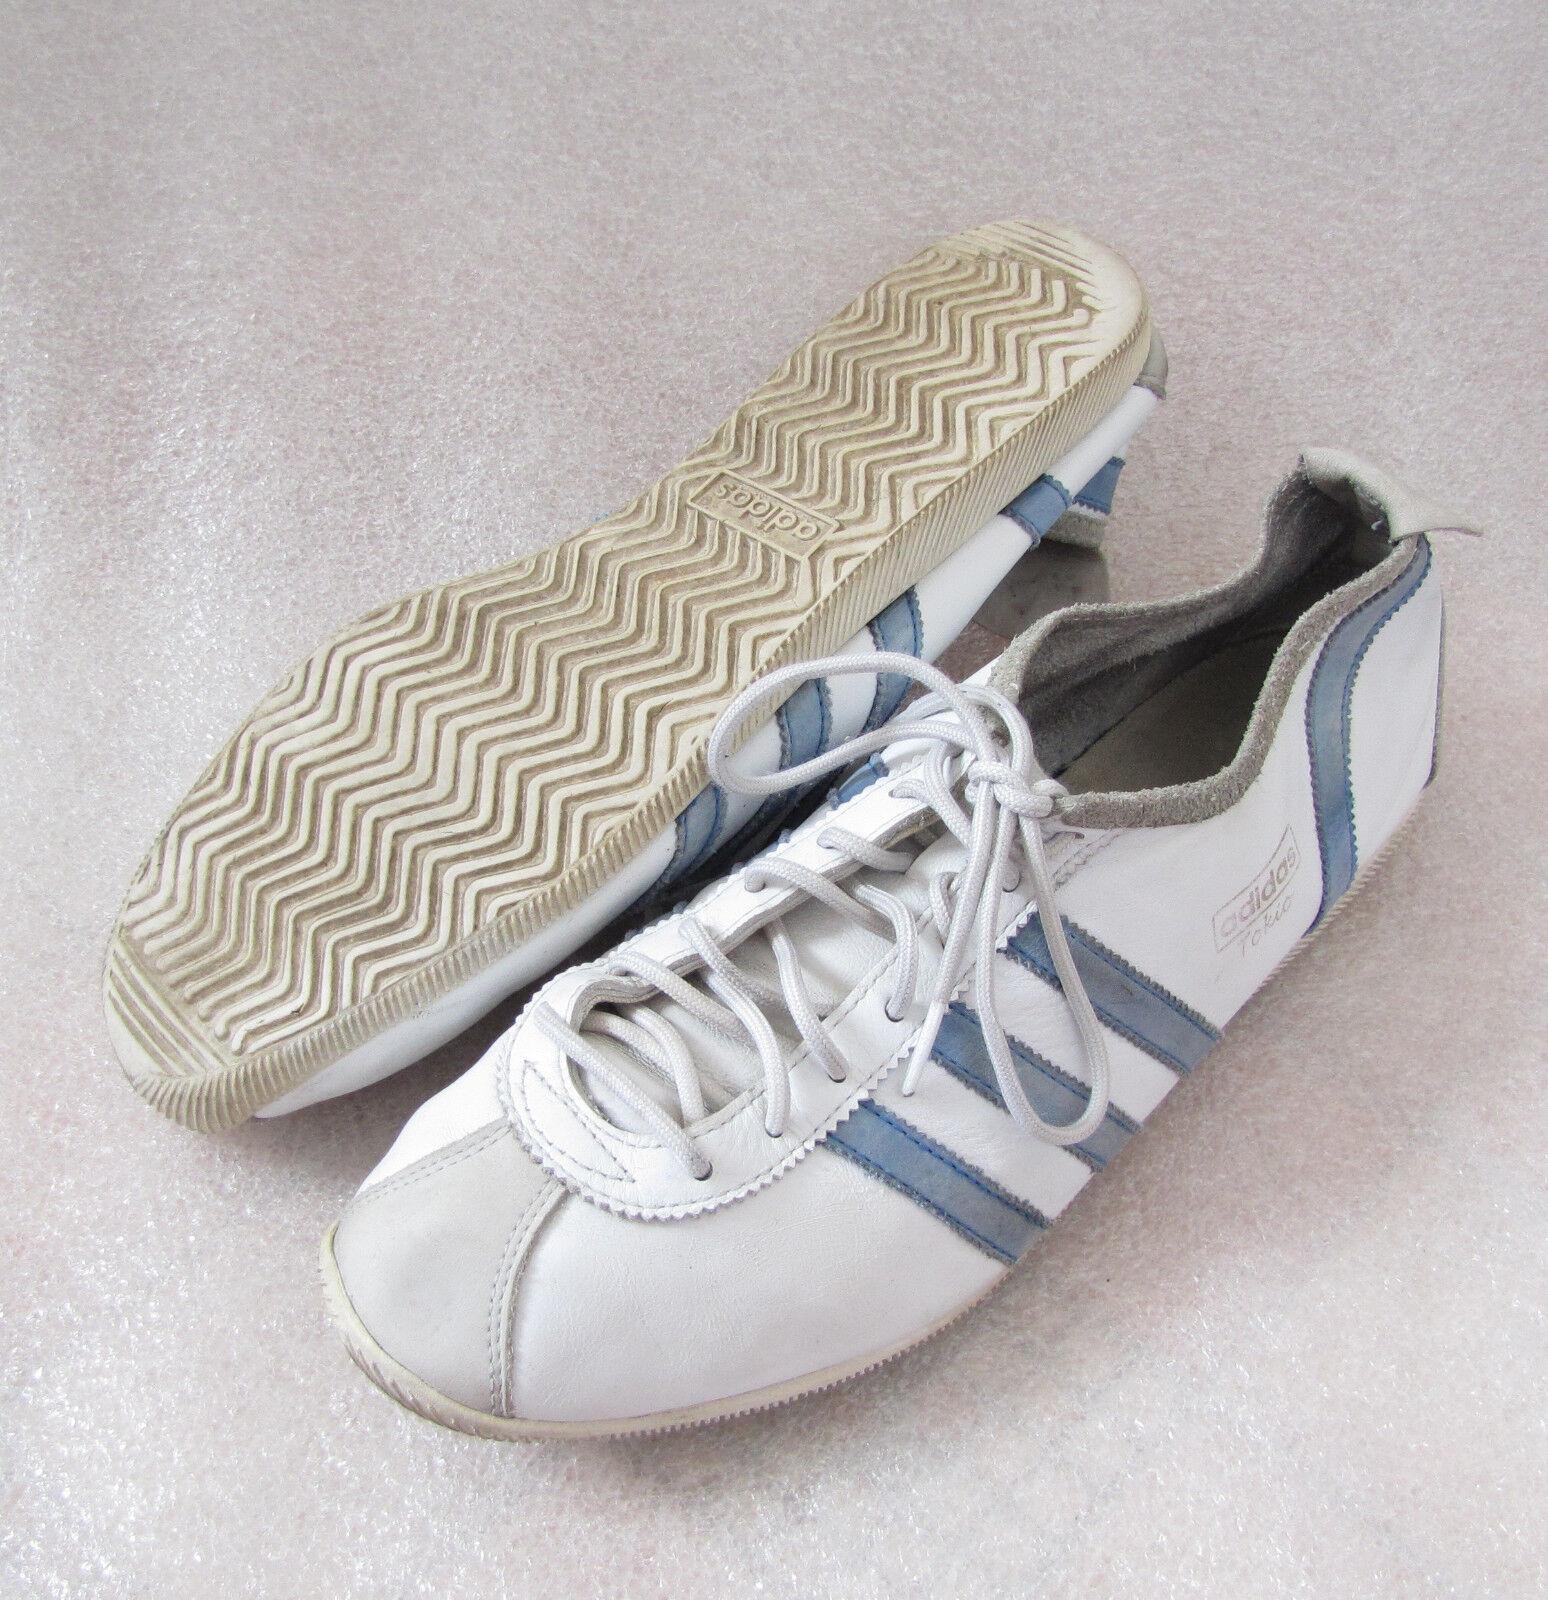 RARE! Adidas Tokio Shoes Size US 11.5 EUR 46  Leather 2008 City